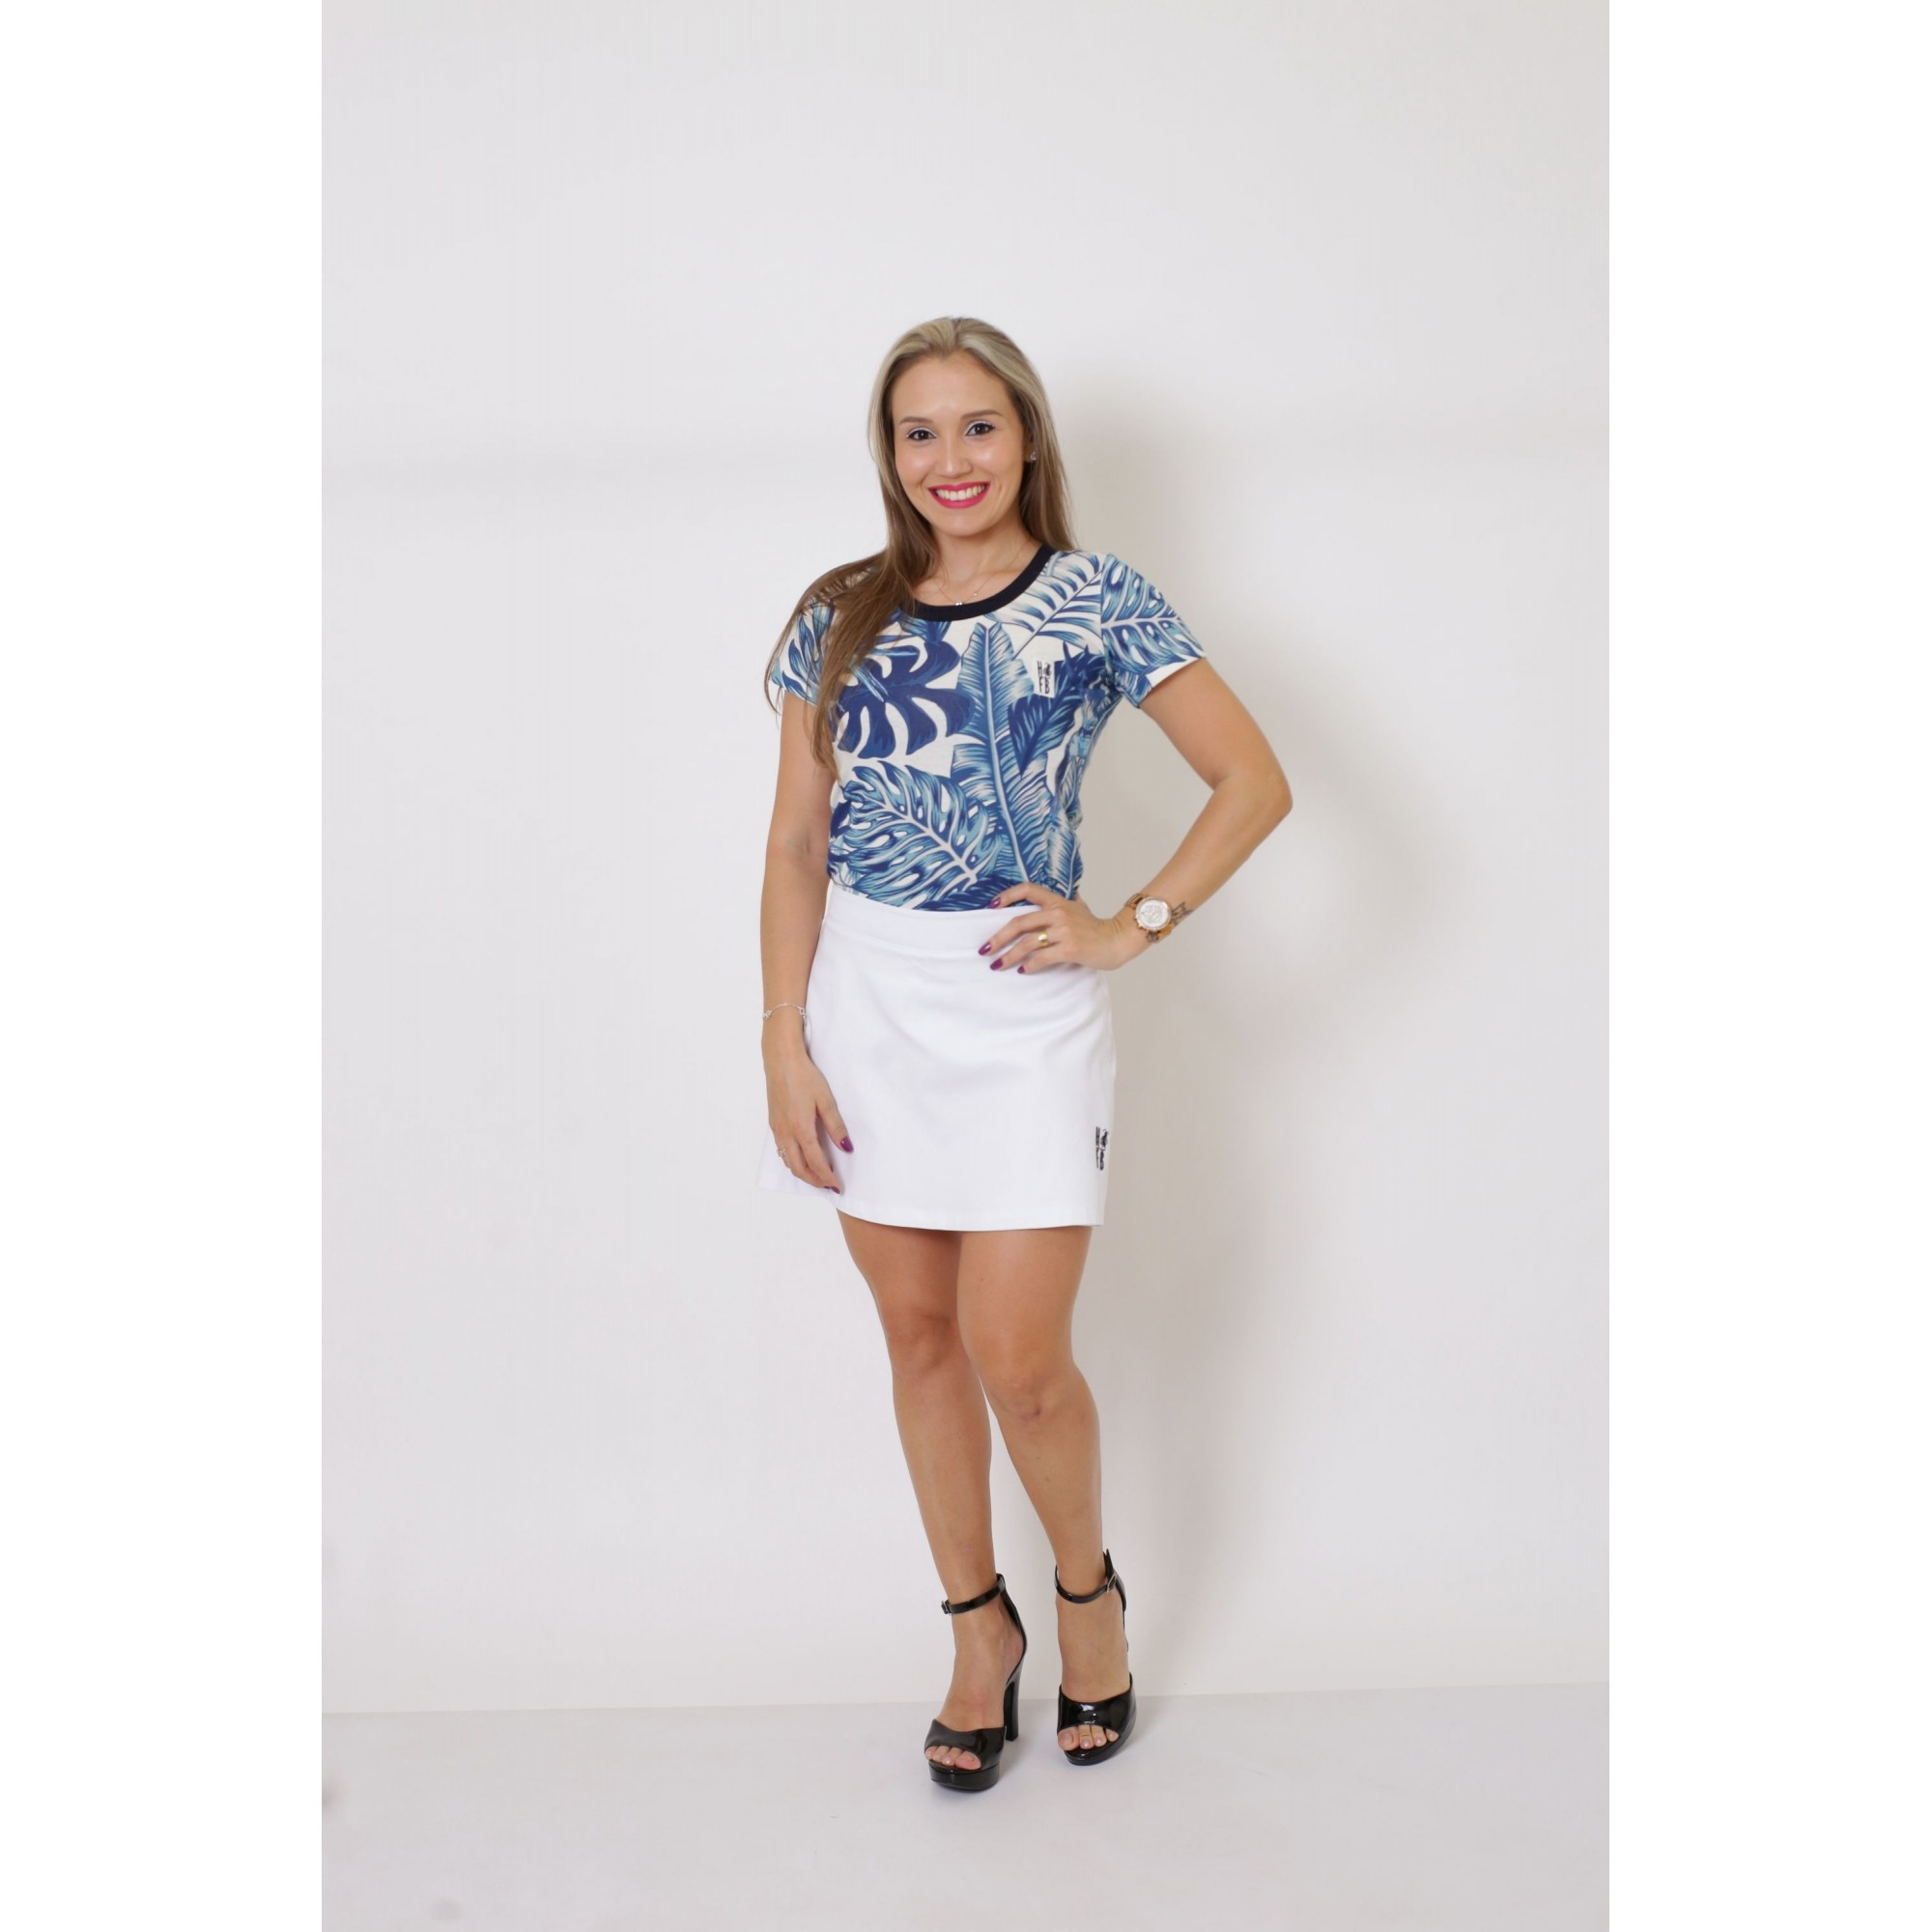 MÃE E FILHA > Kit 02 Peças T-Shirts - Caribe [Coleção Tal Mãe Tal Filha]  - Heitor Fashion Brazil